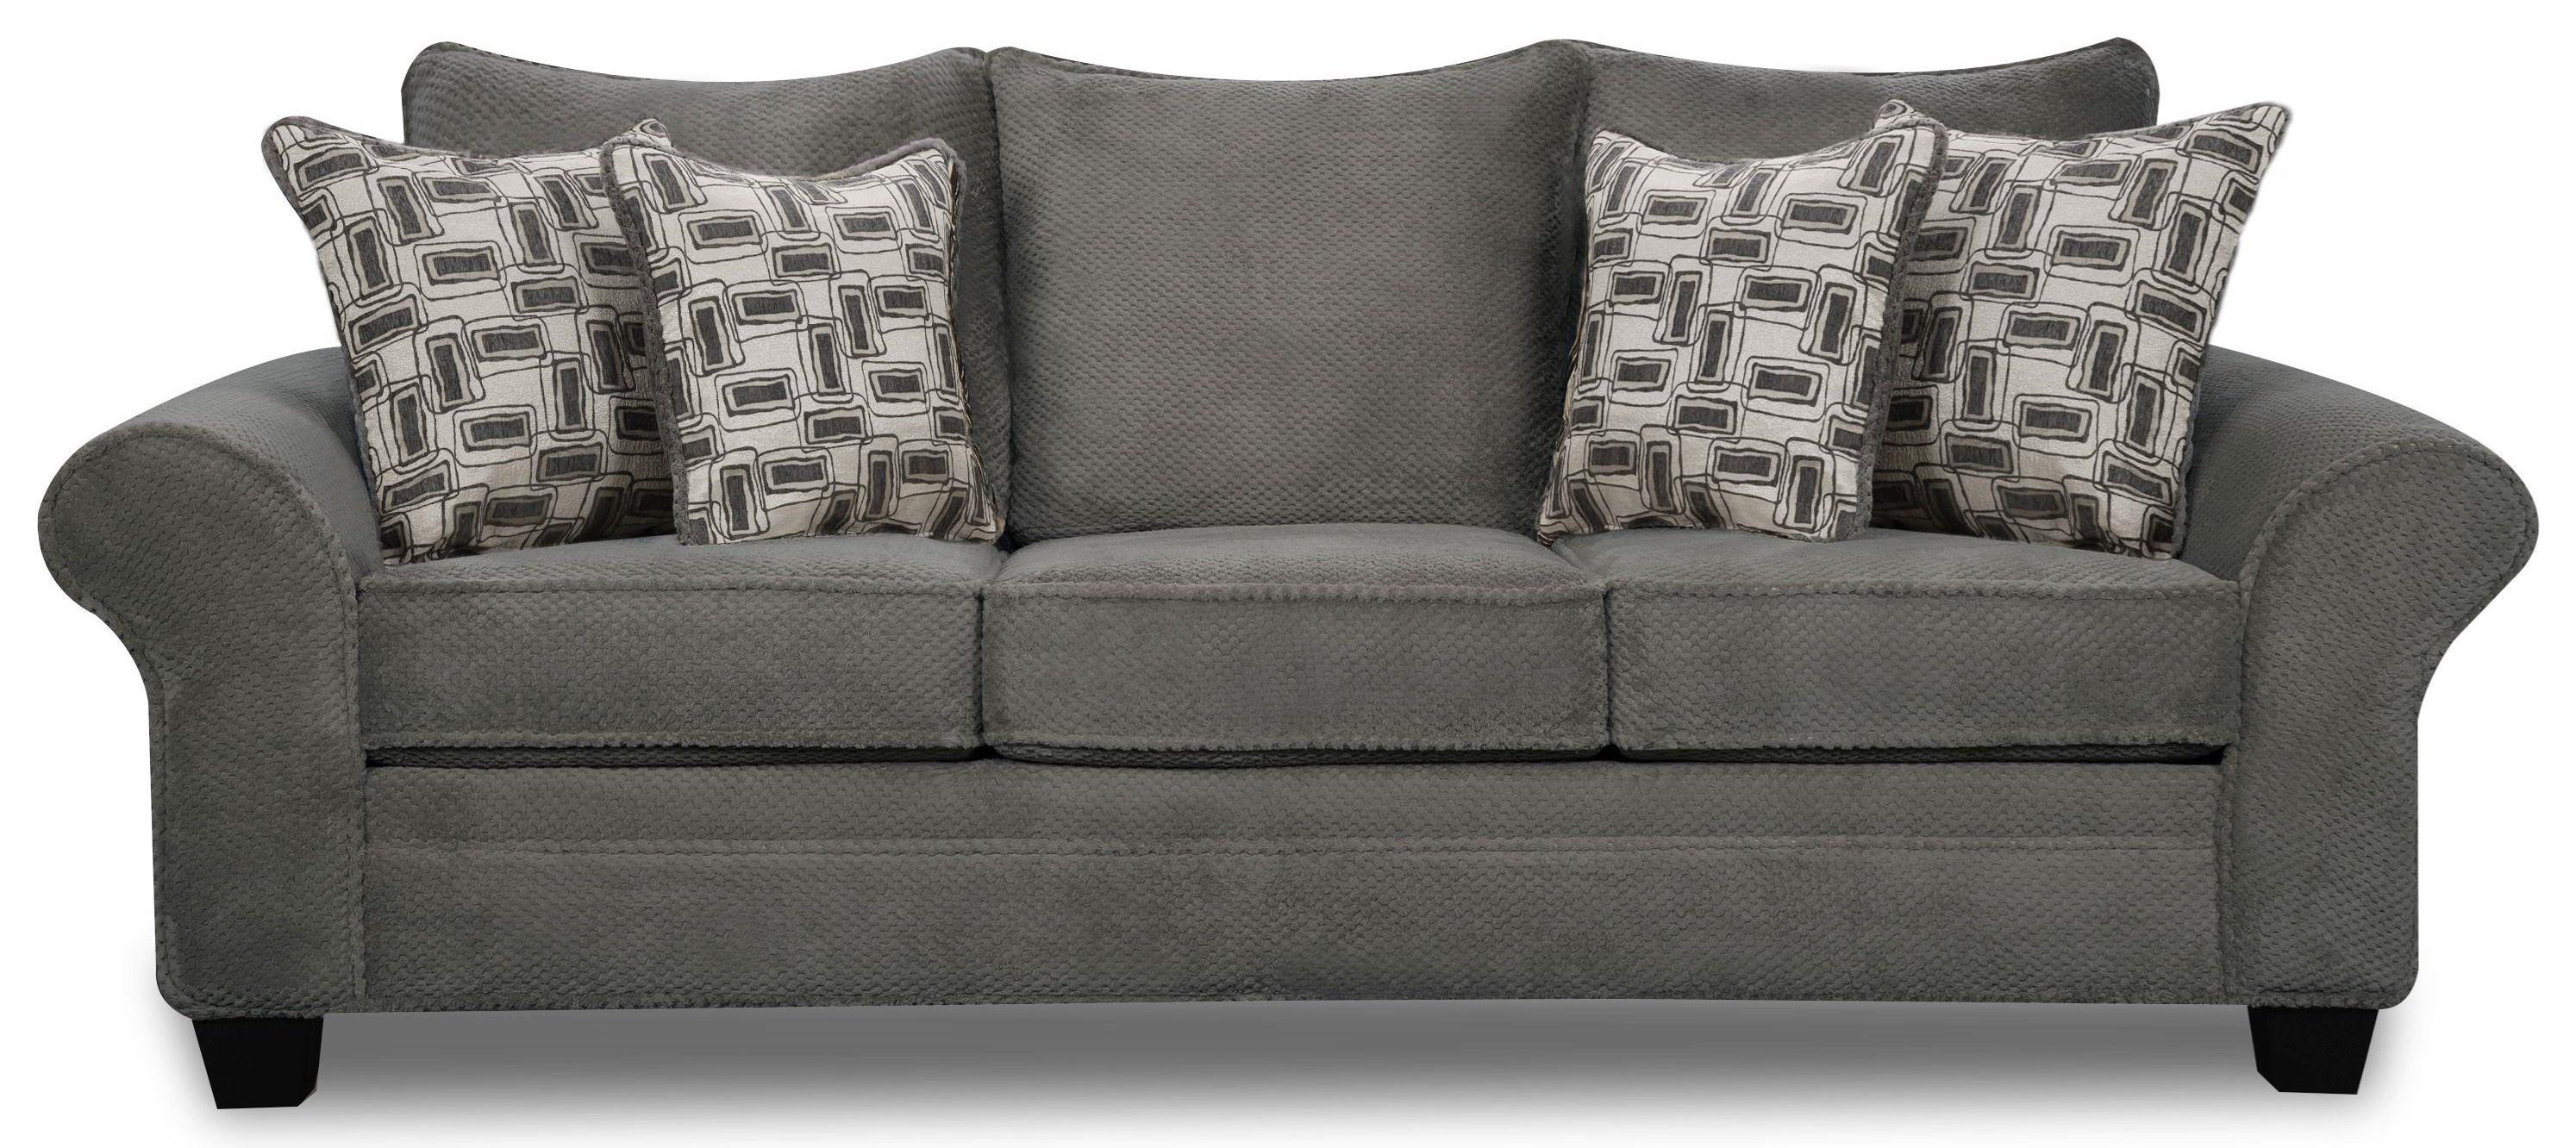 Granada Roll-Arm Sofa at Rotmans